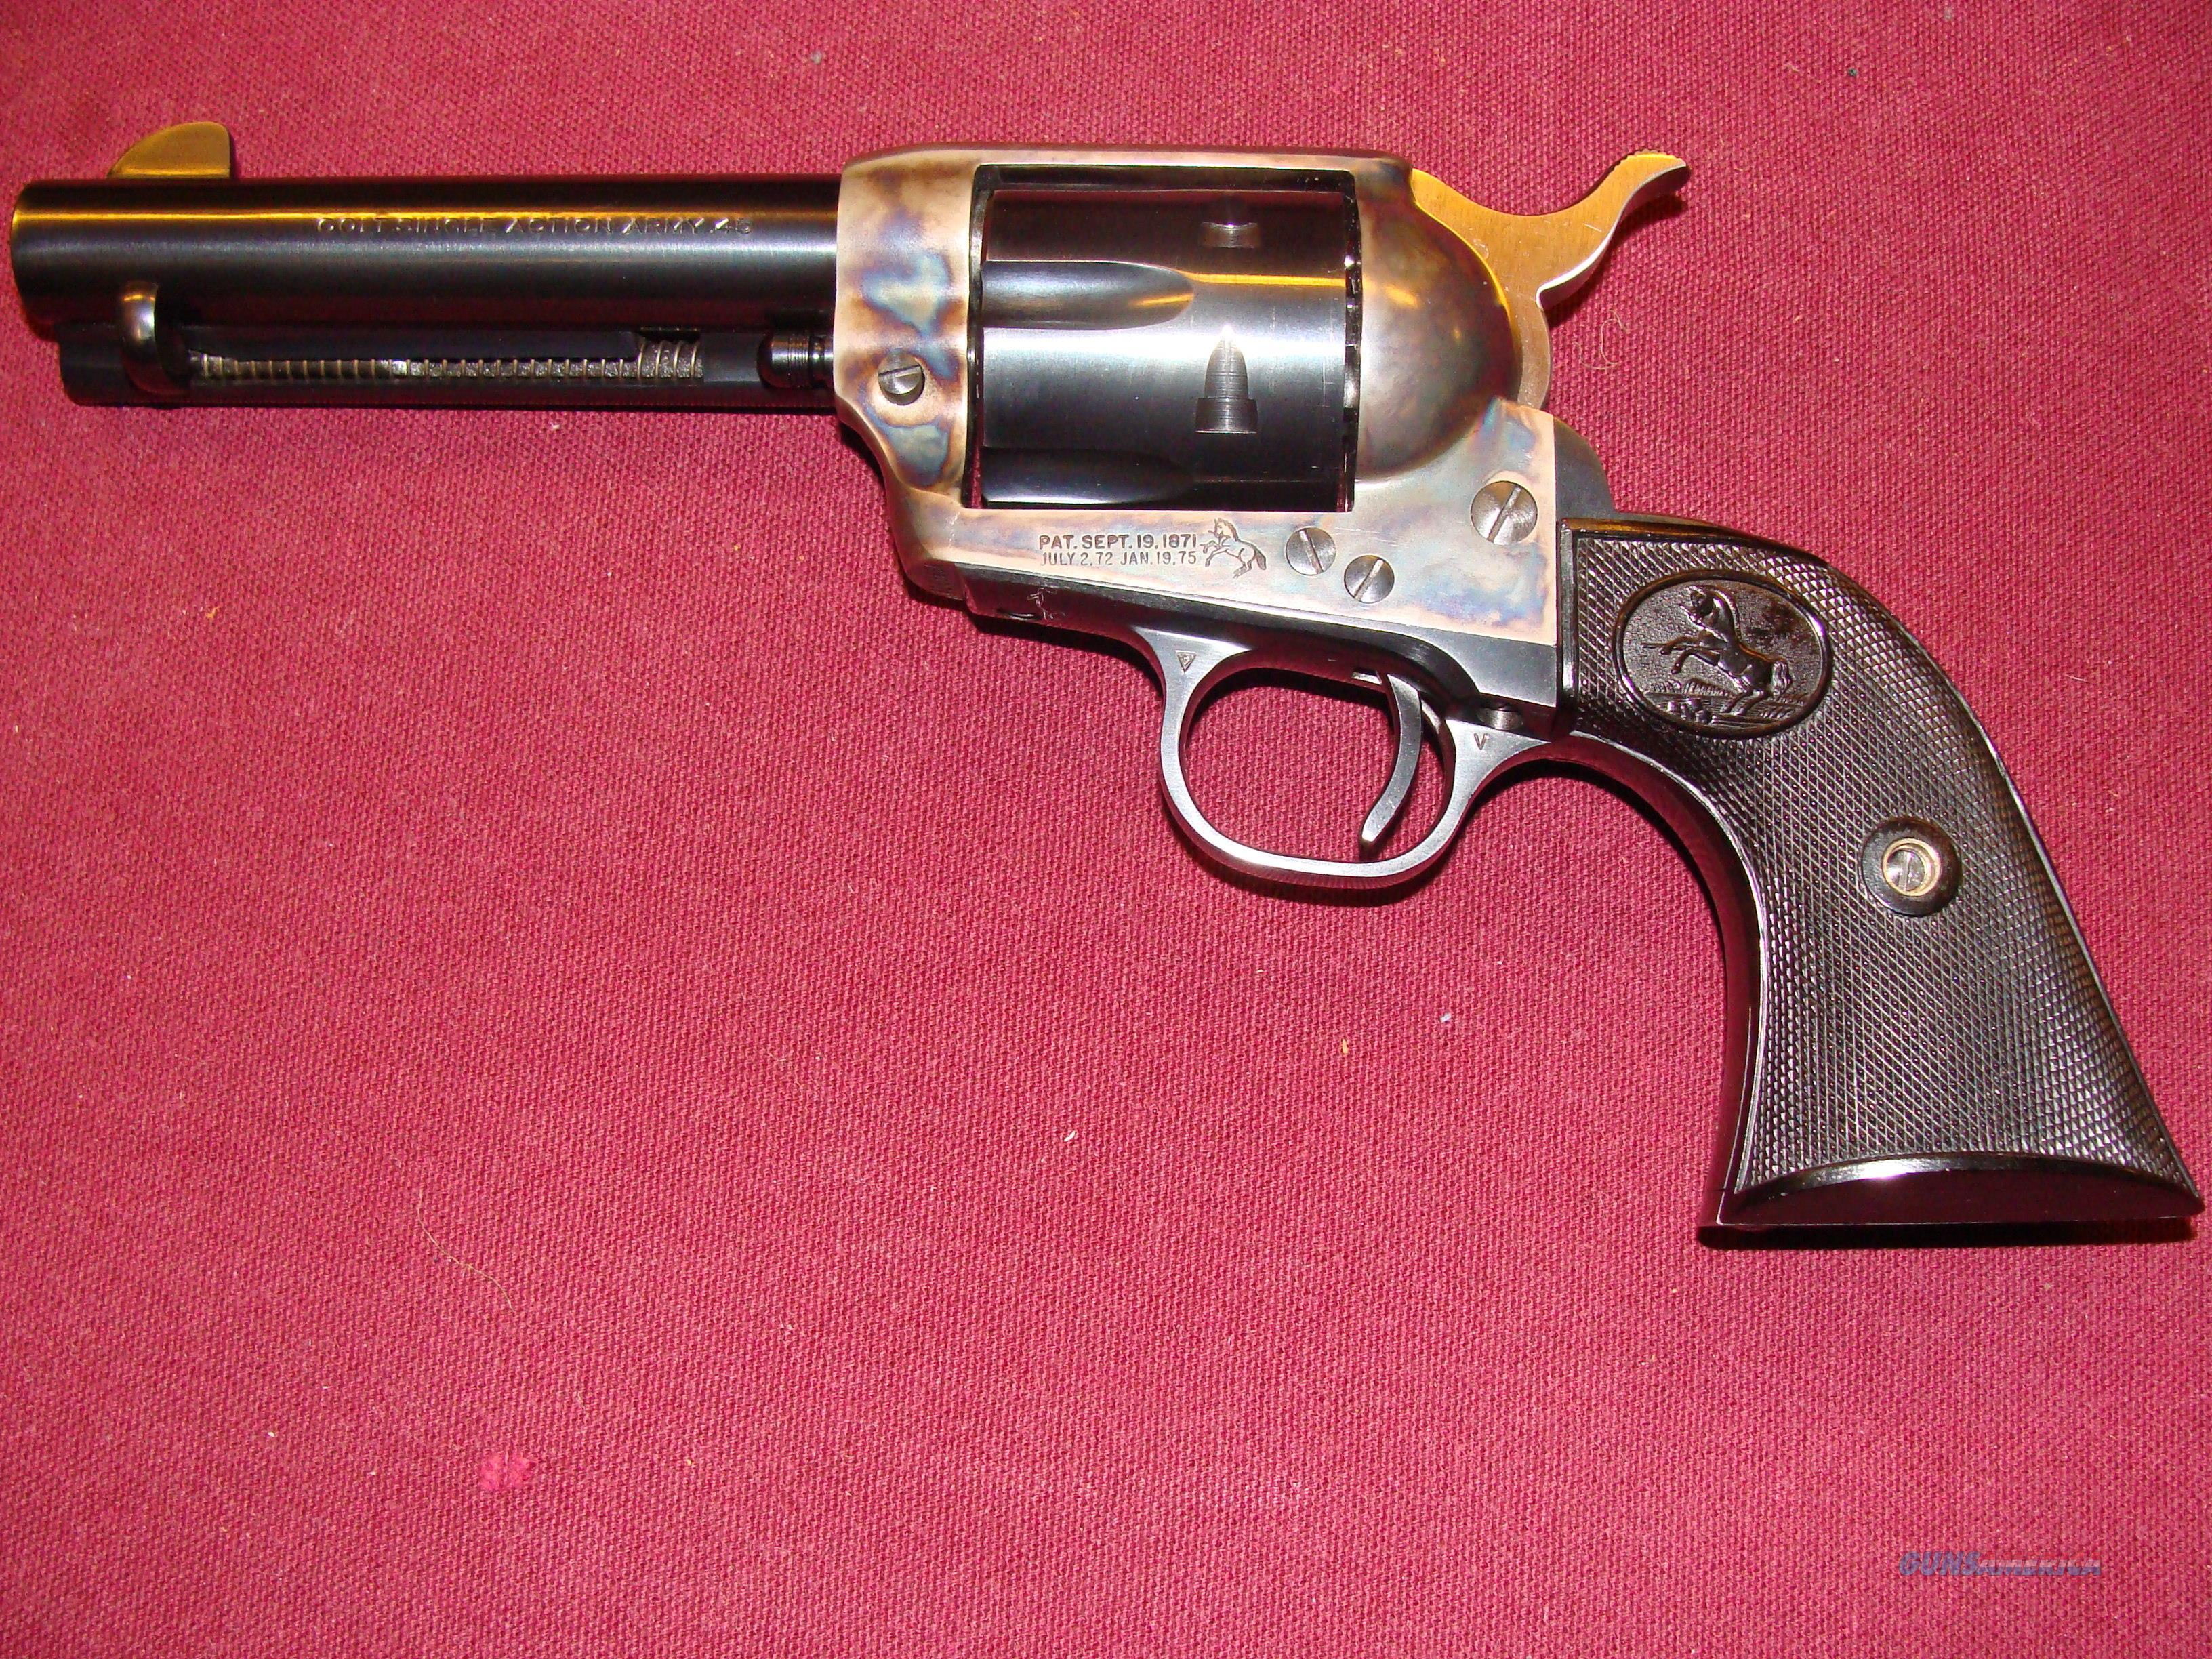 1966 2nd Generation 4 3/4 inch 45  Guns > Pistols > Colt Single Action Revolvers - 2nd Gen.